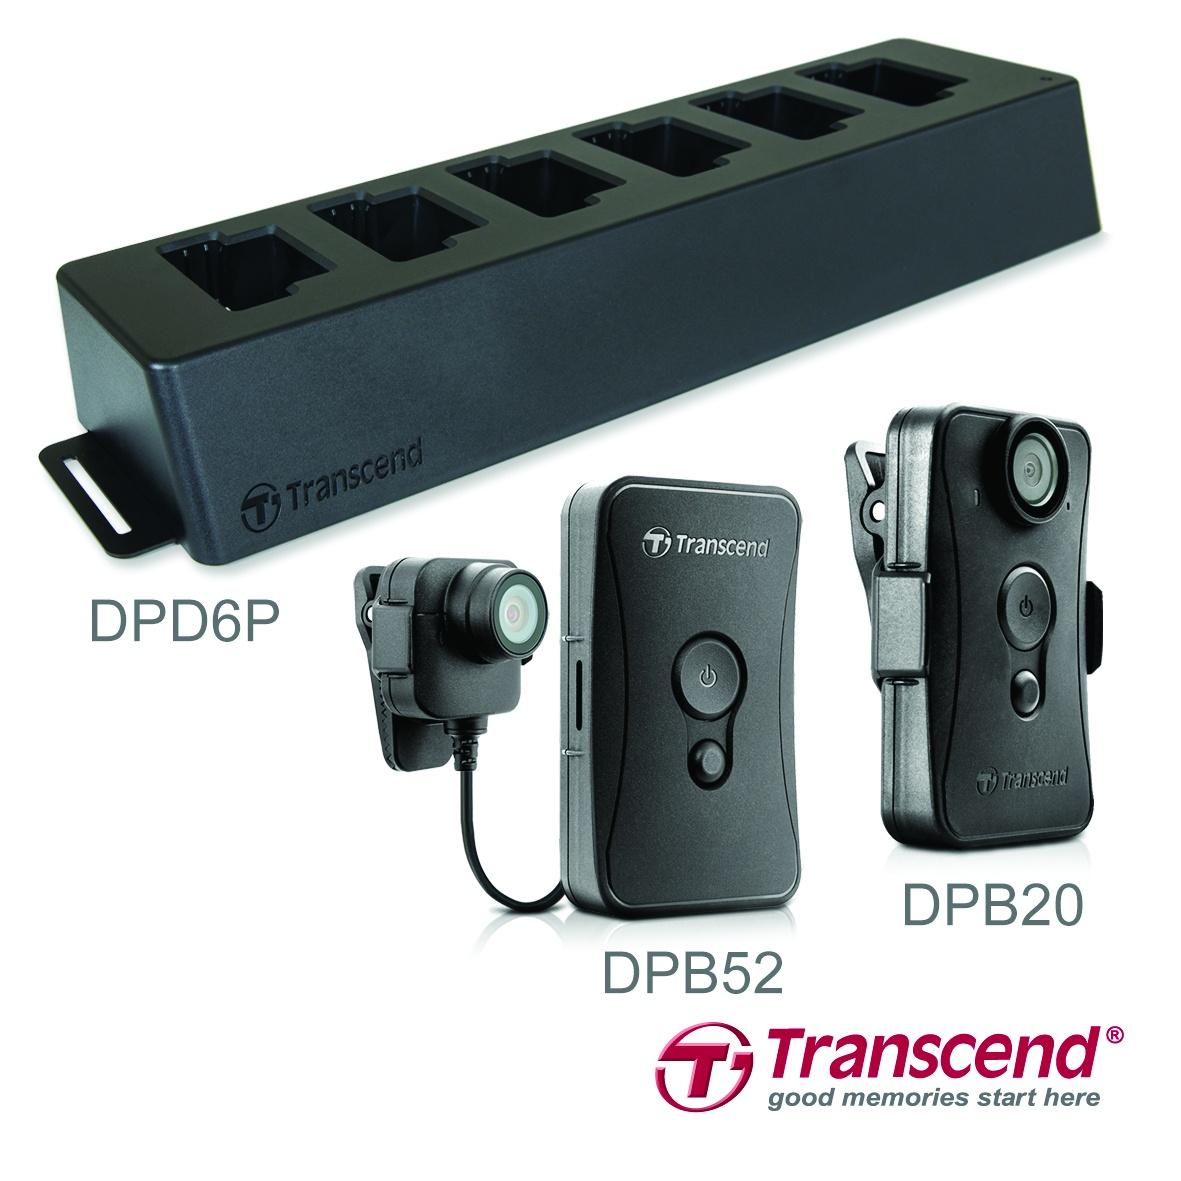 Представлены нагрудные камеры Transcend DrivePro Body 20 и DrivePro Body 52 Body